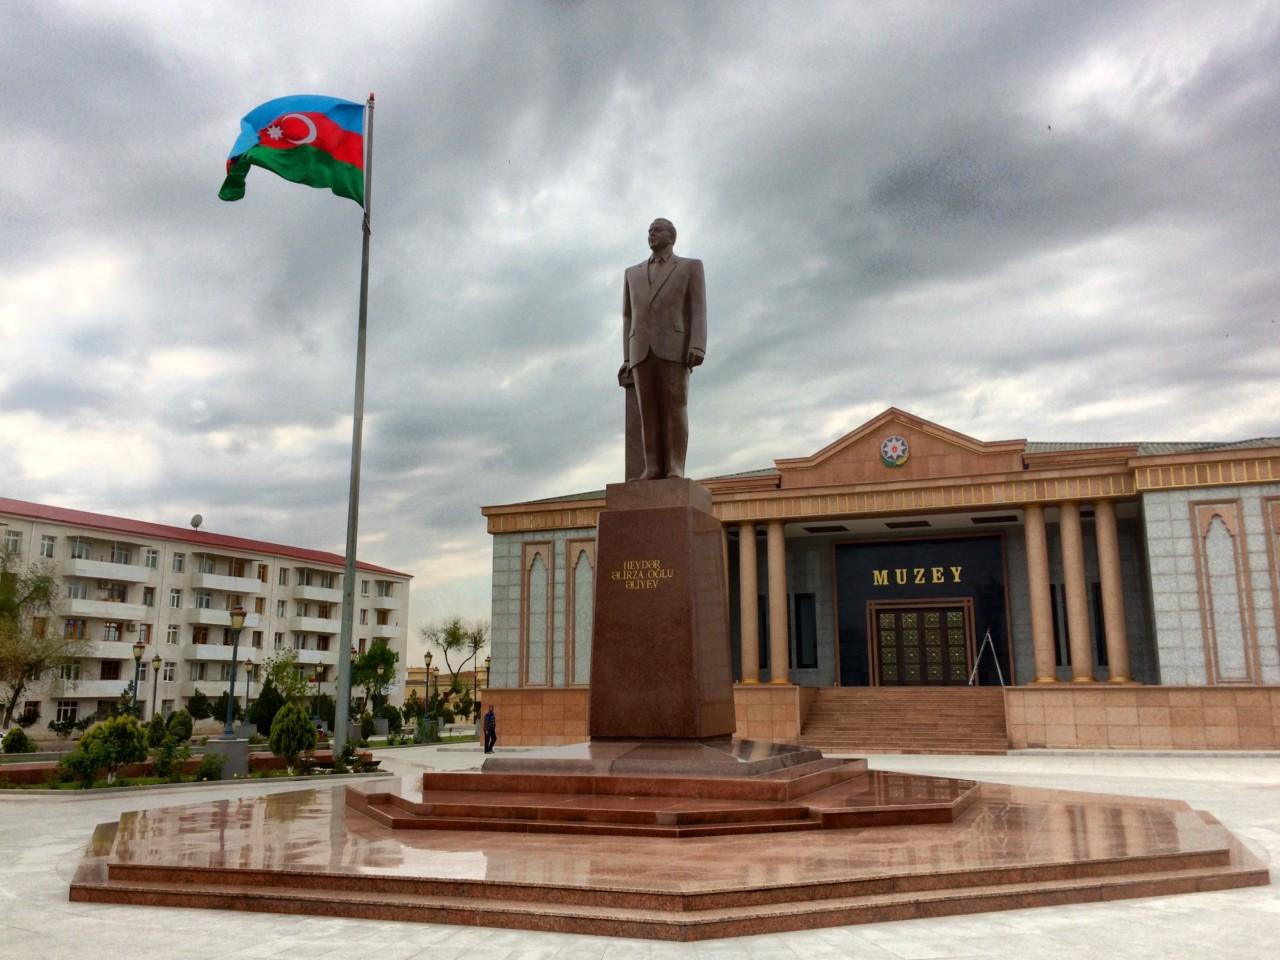 Heydar Aliyev statue in Nakhchivan